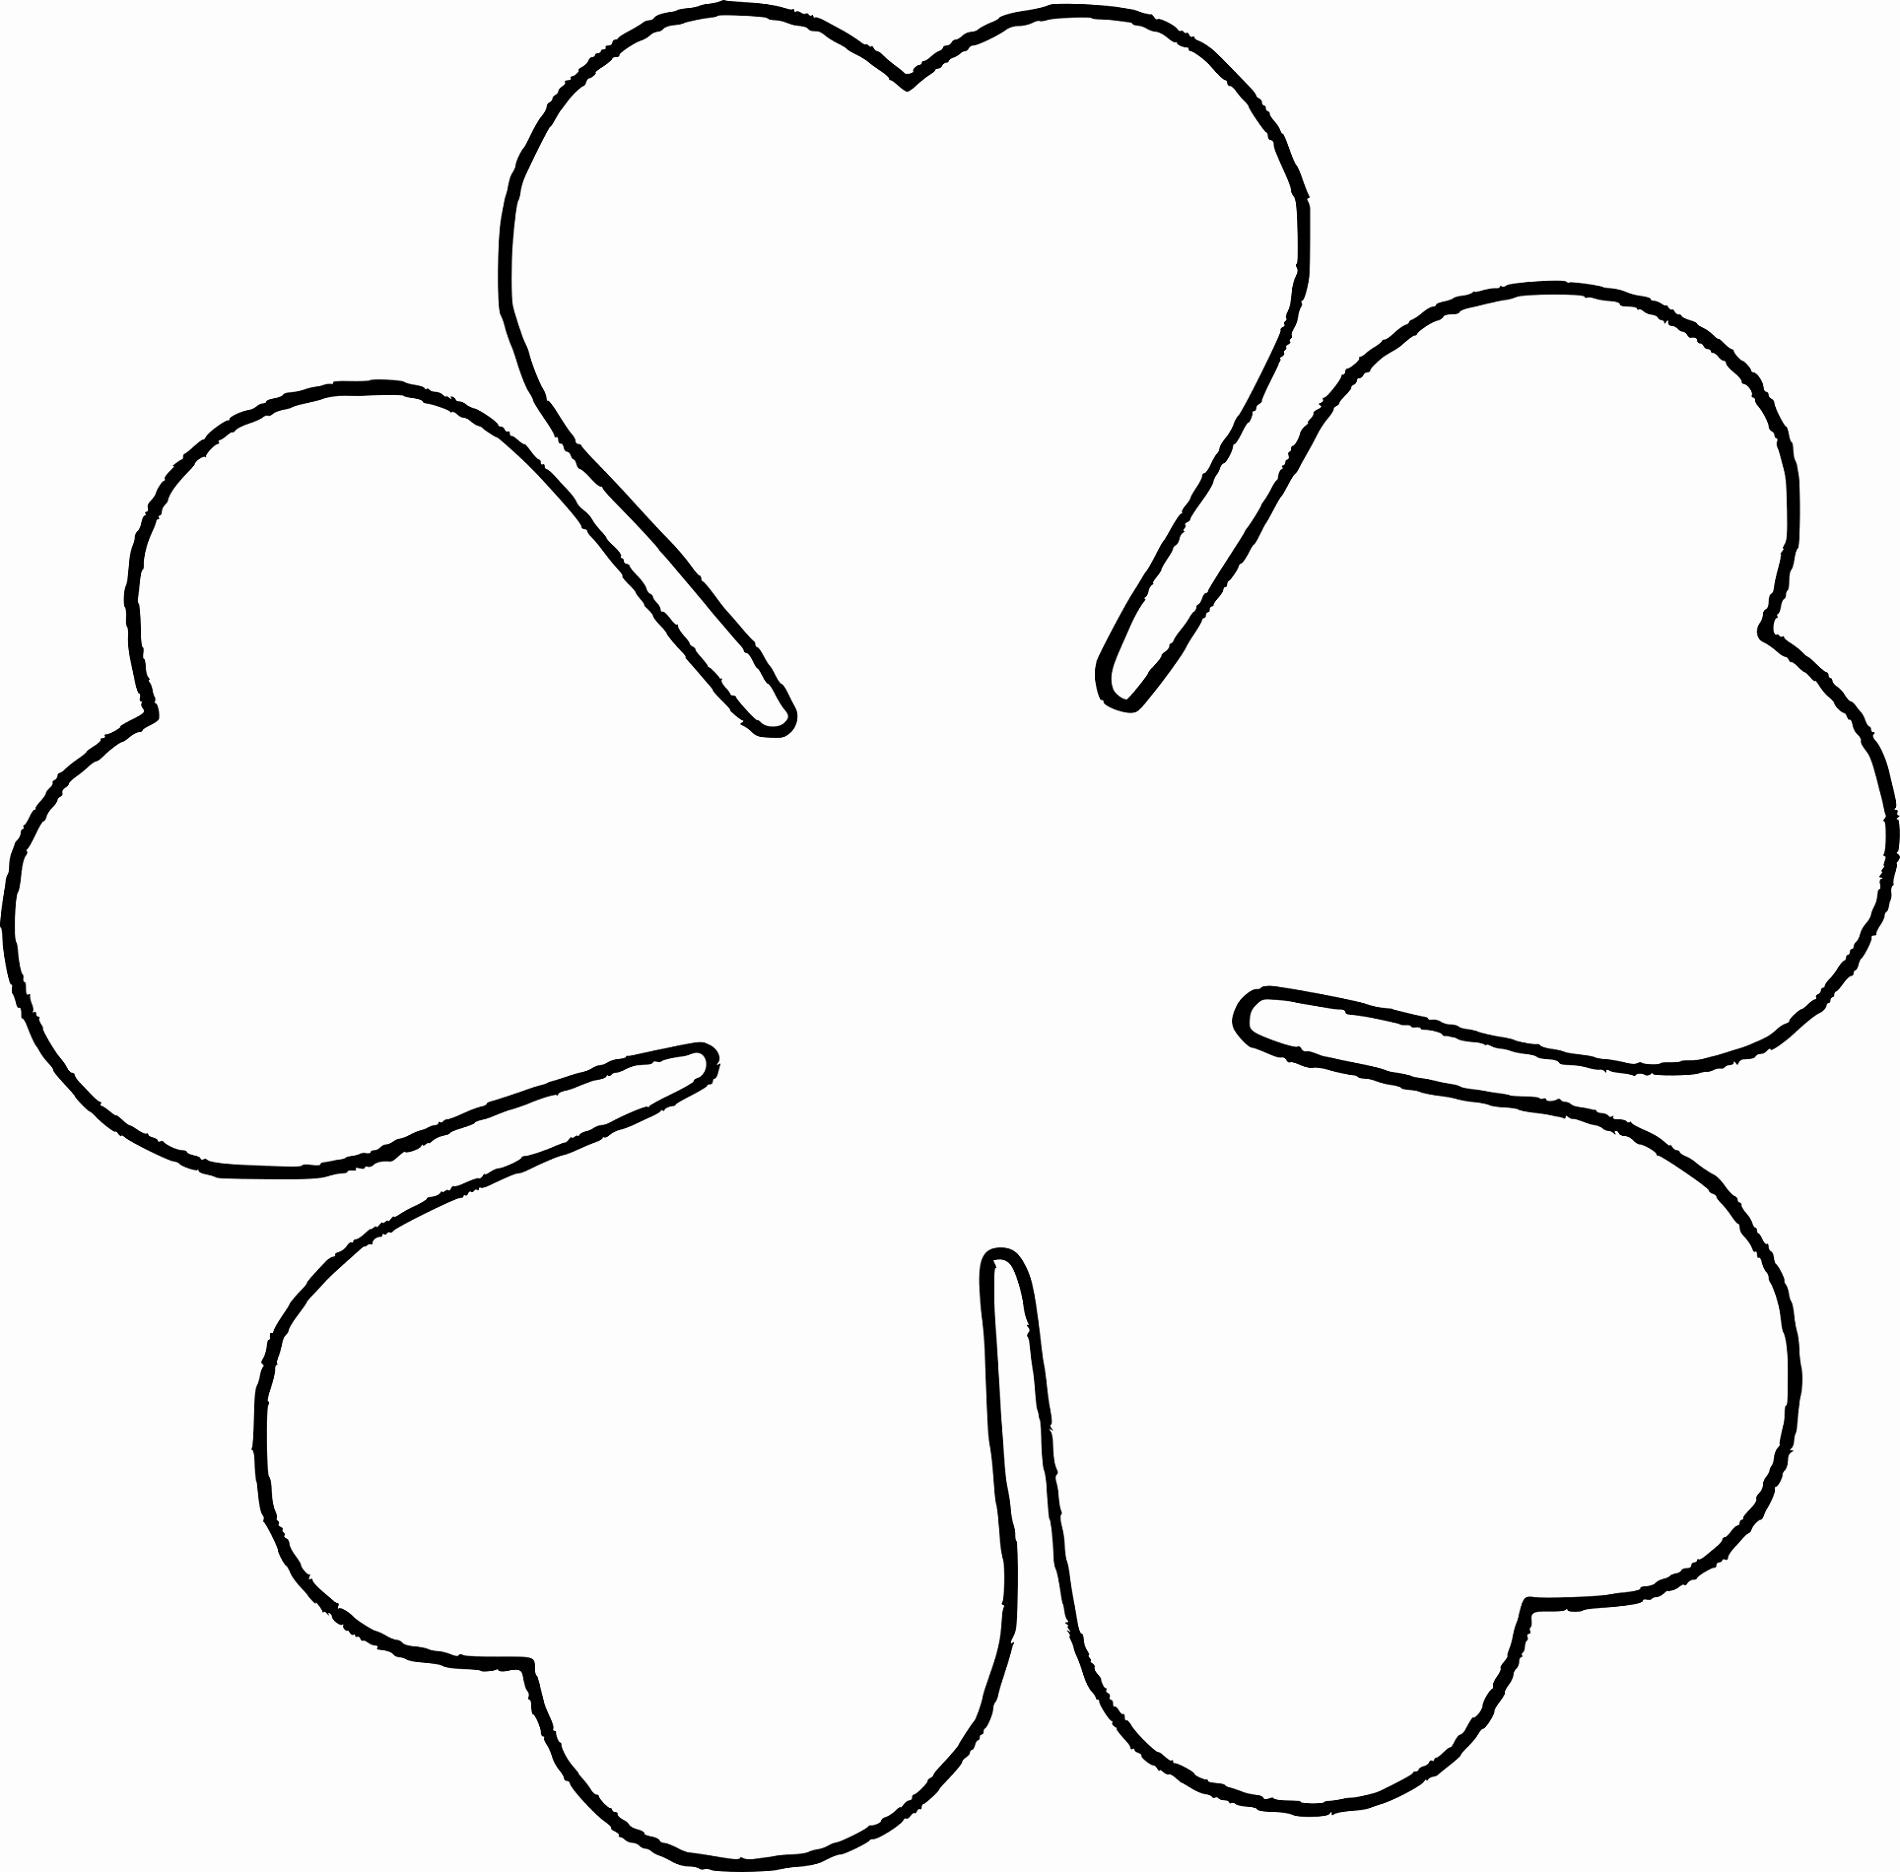 Rose Petal Template Inspirational Flower Template for Children S Activities